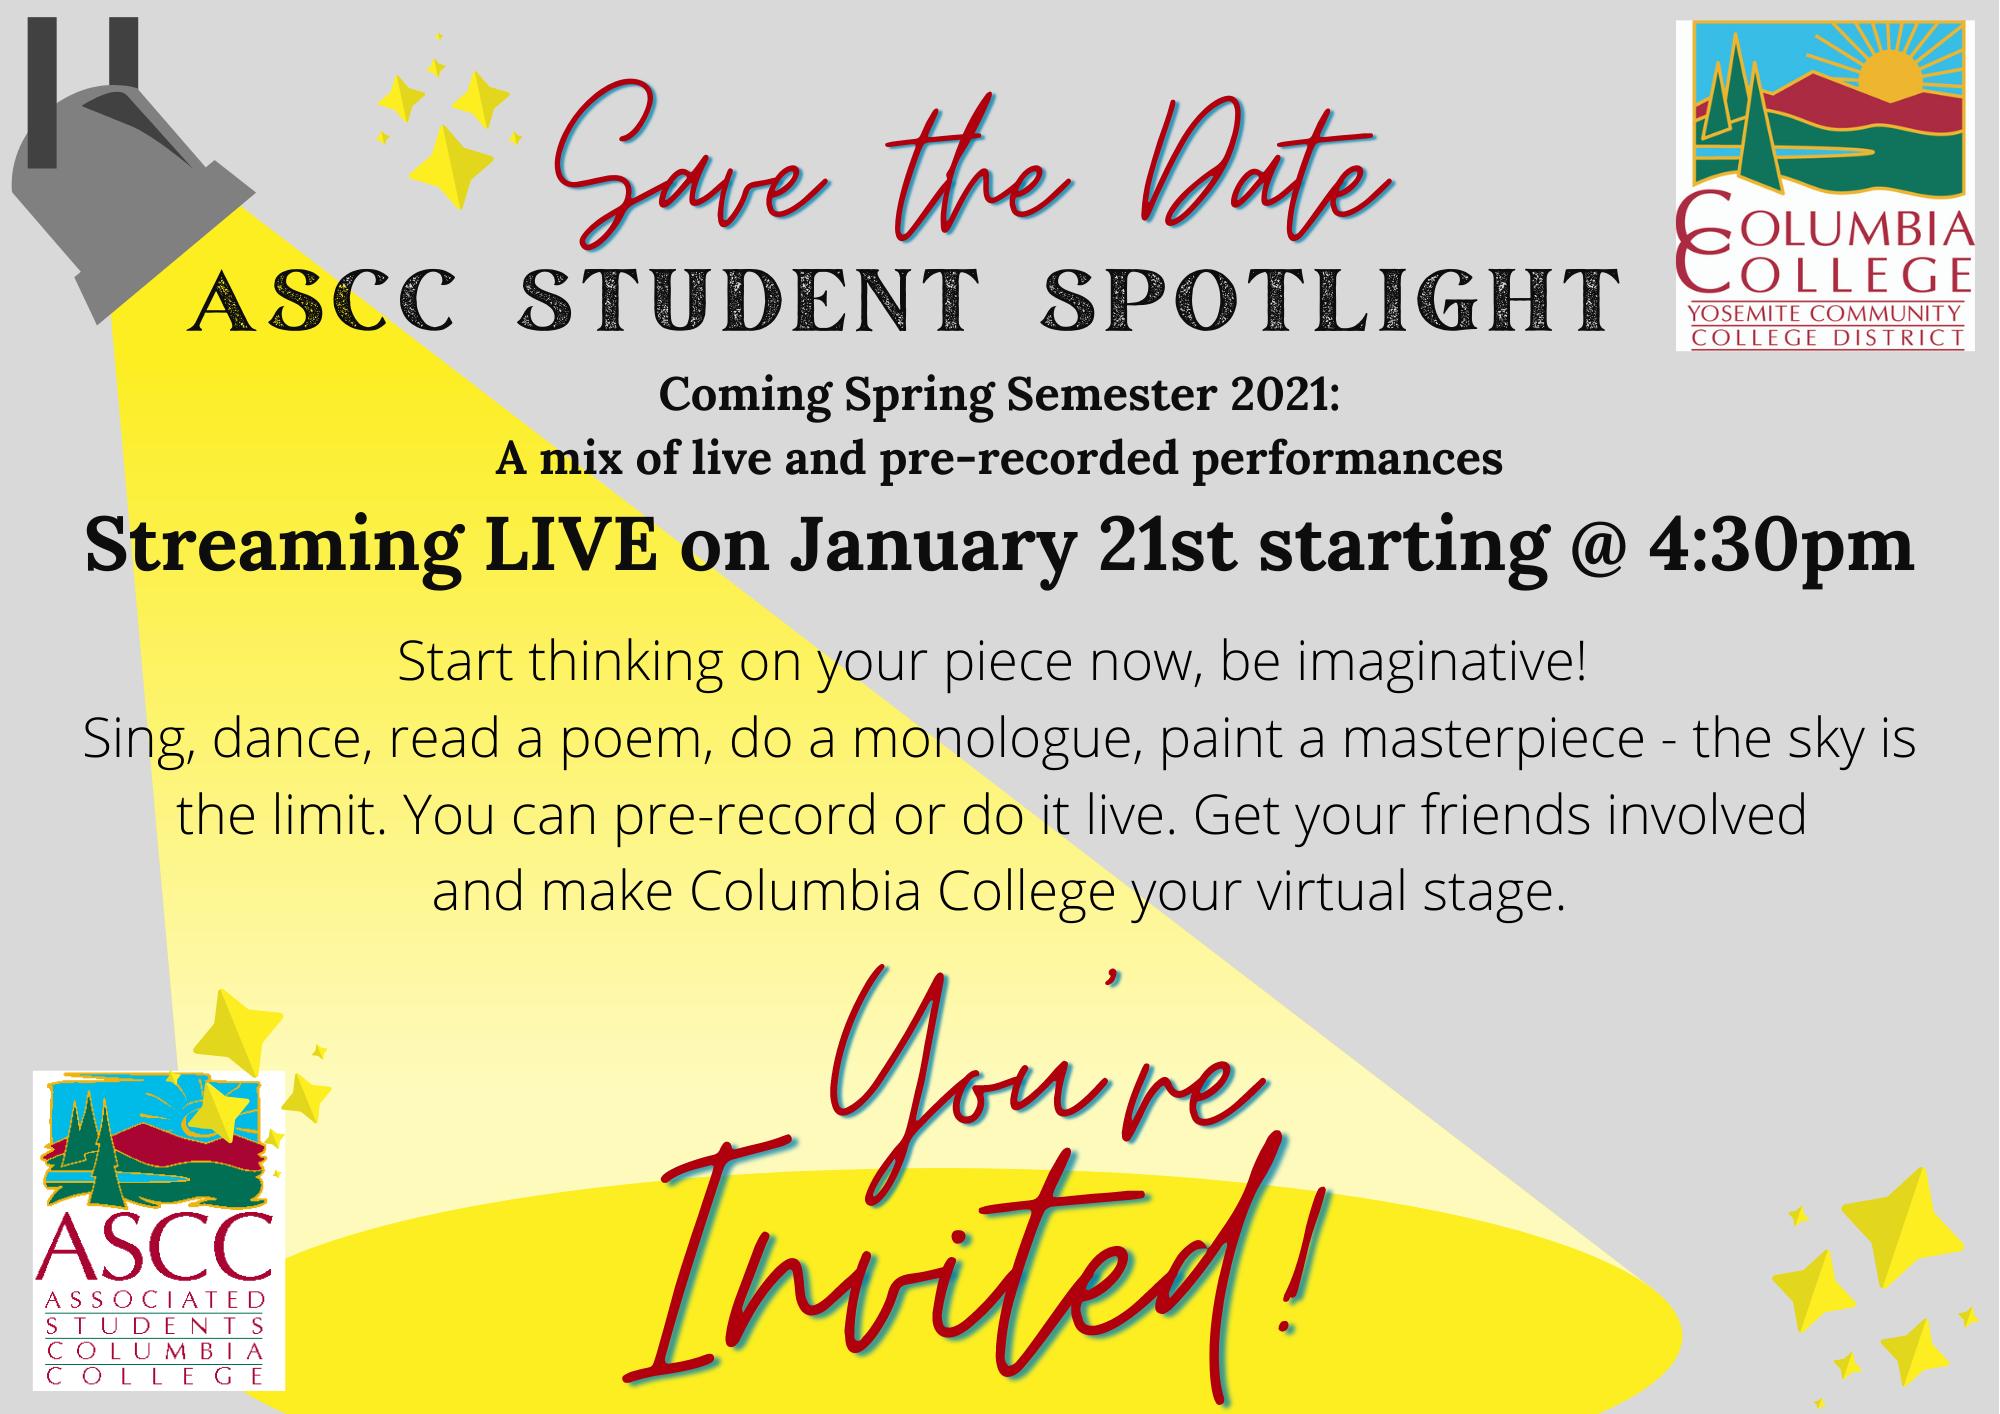 Student Spotlight Save the Date